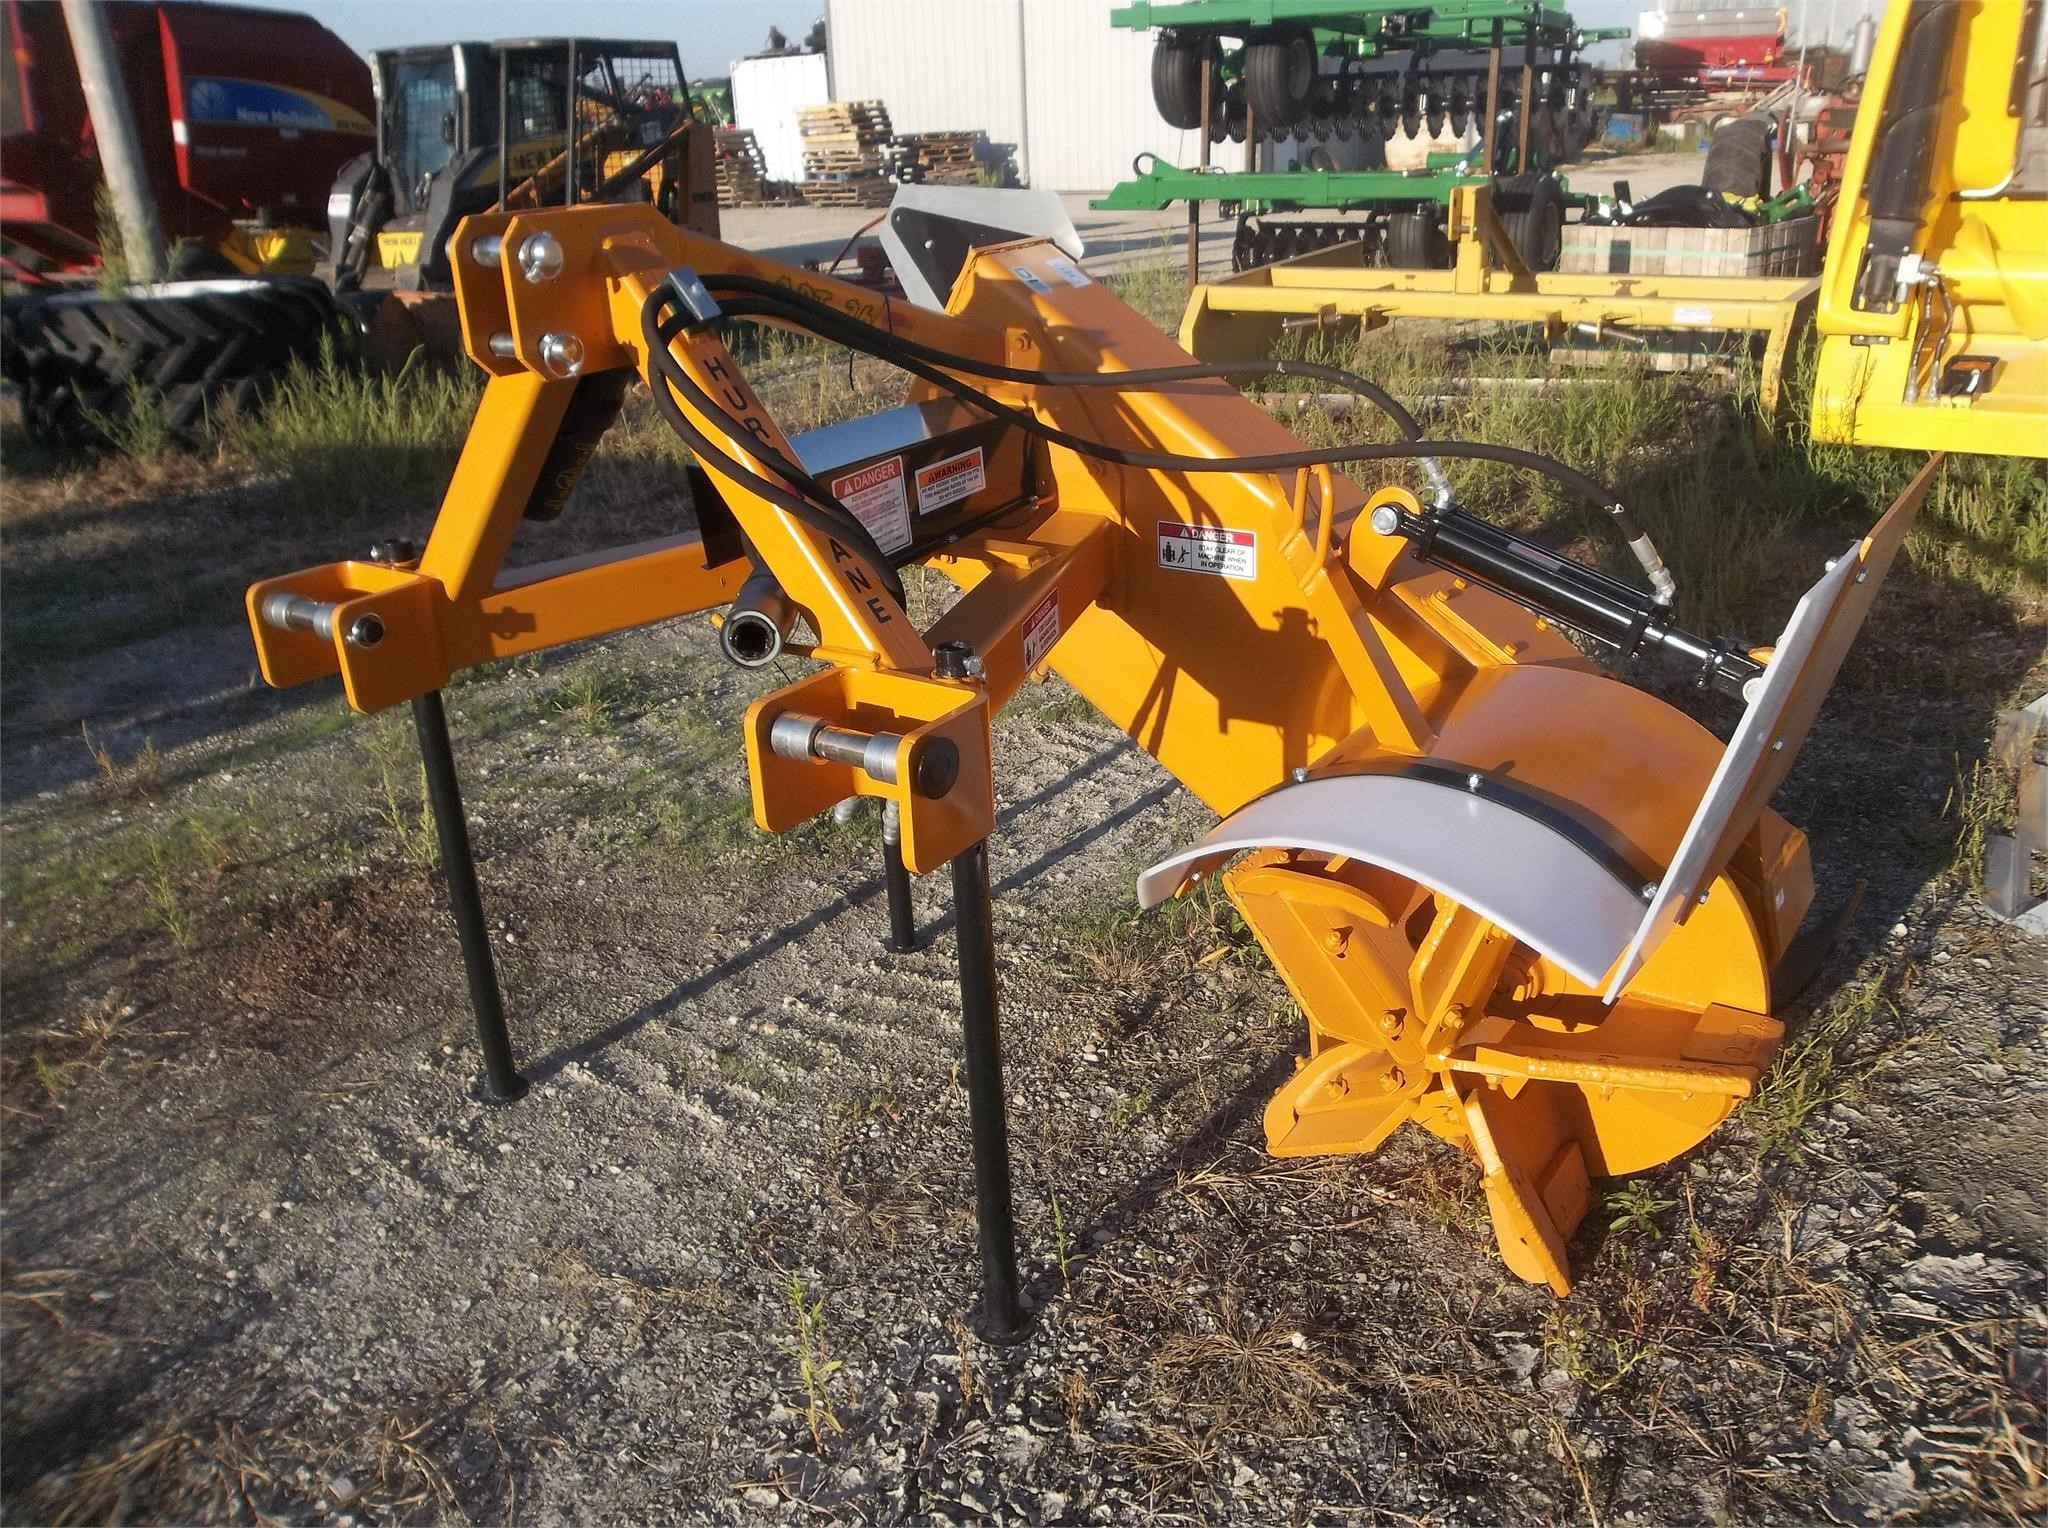 Hurricane Ditcher 3PT26 Field Drainage Equipment